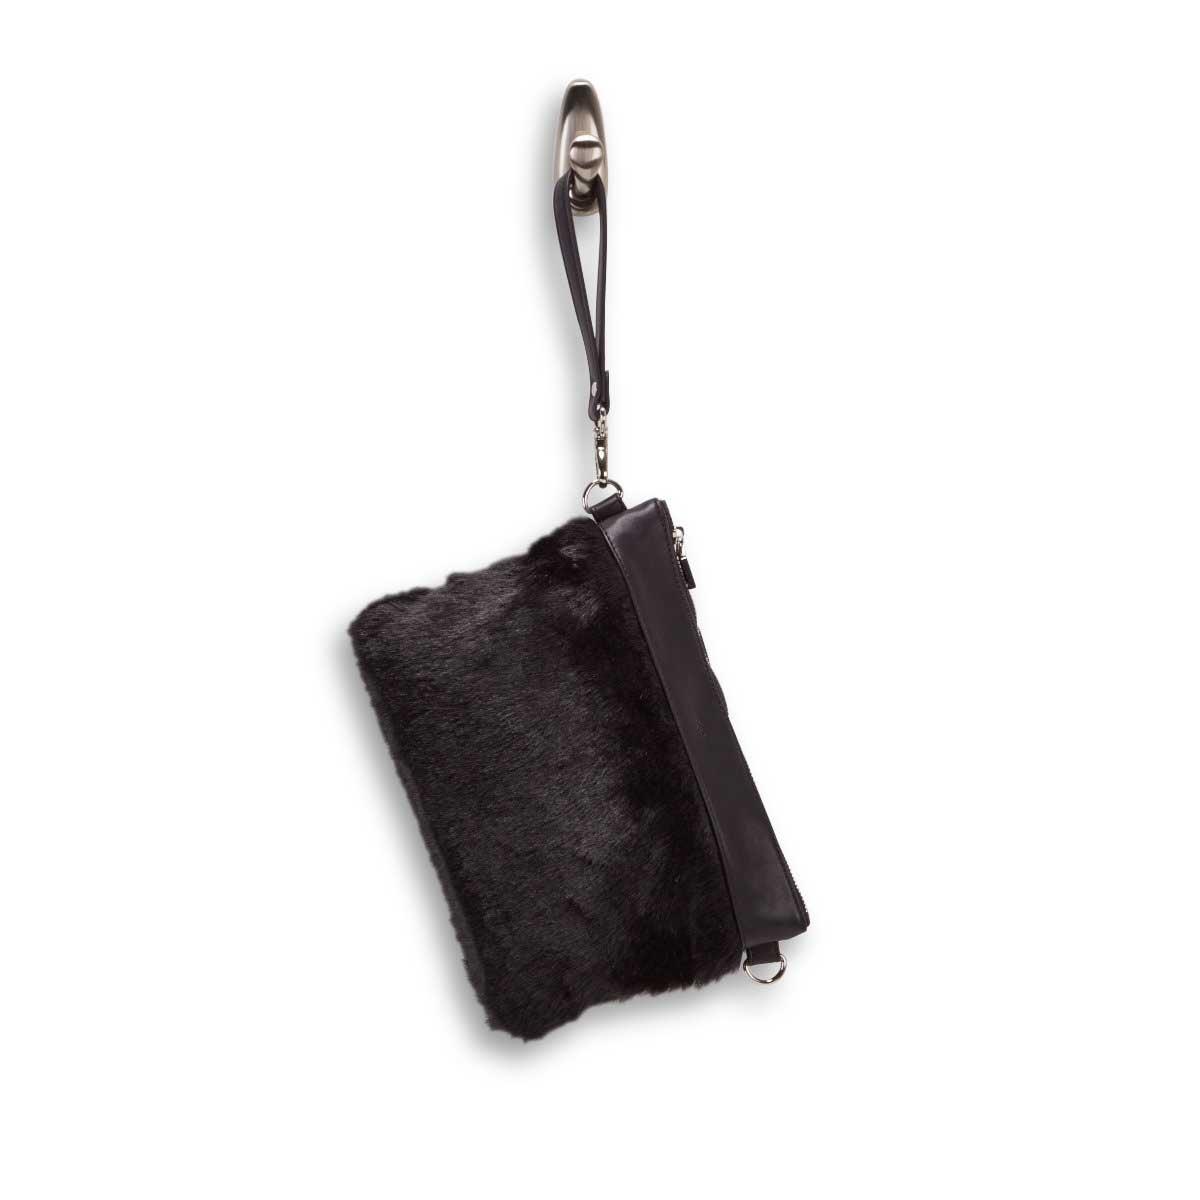 Lds black clutch crossbody